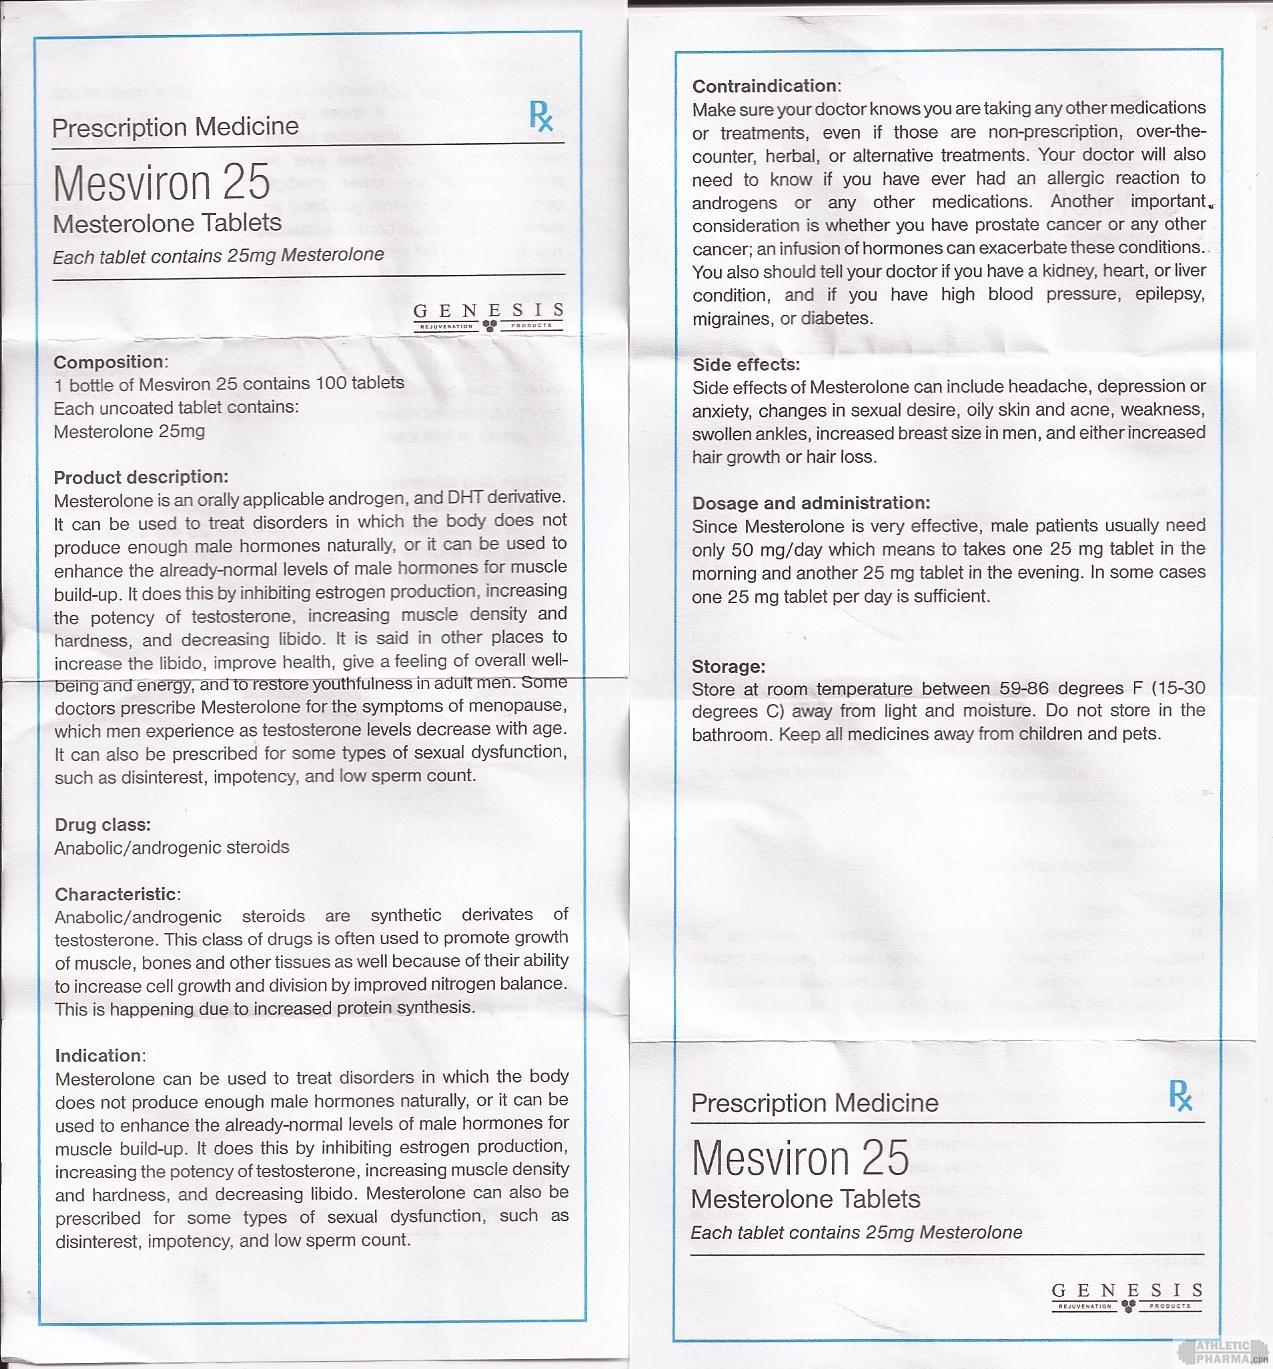 Mesviron 25 genesis инструкция (вкладыш)